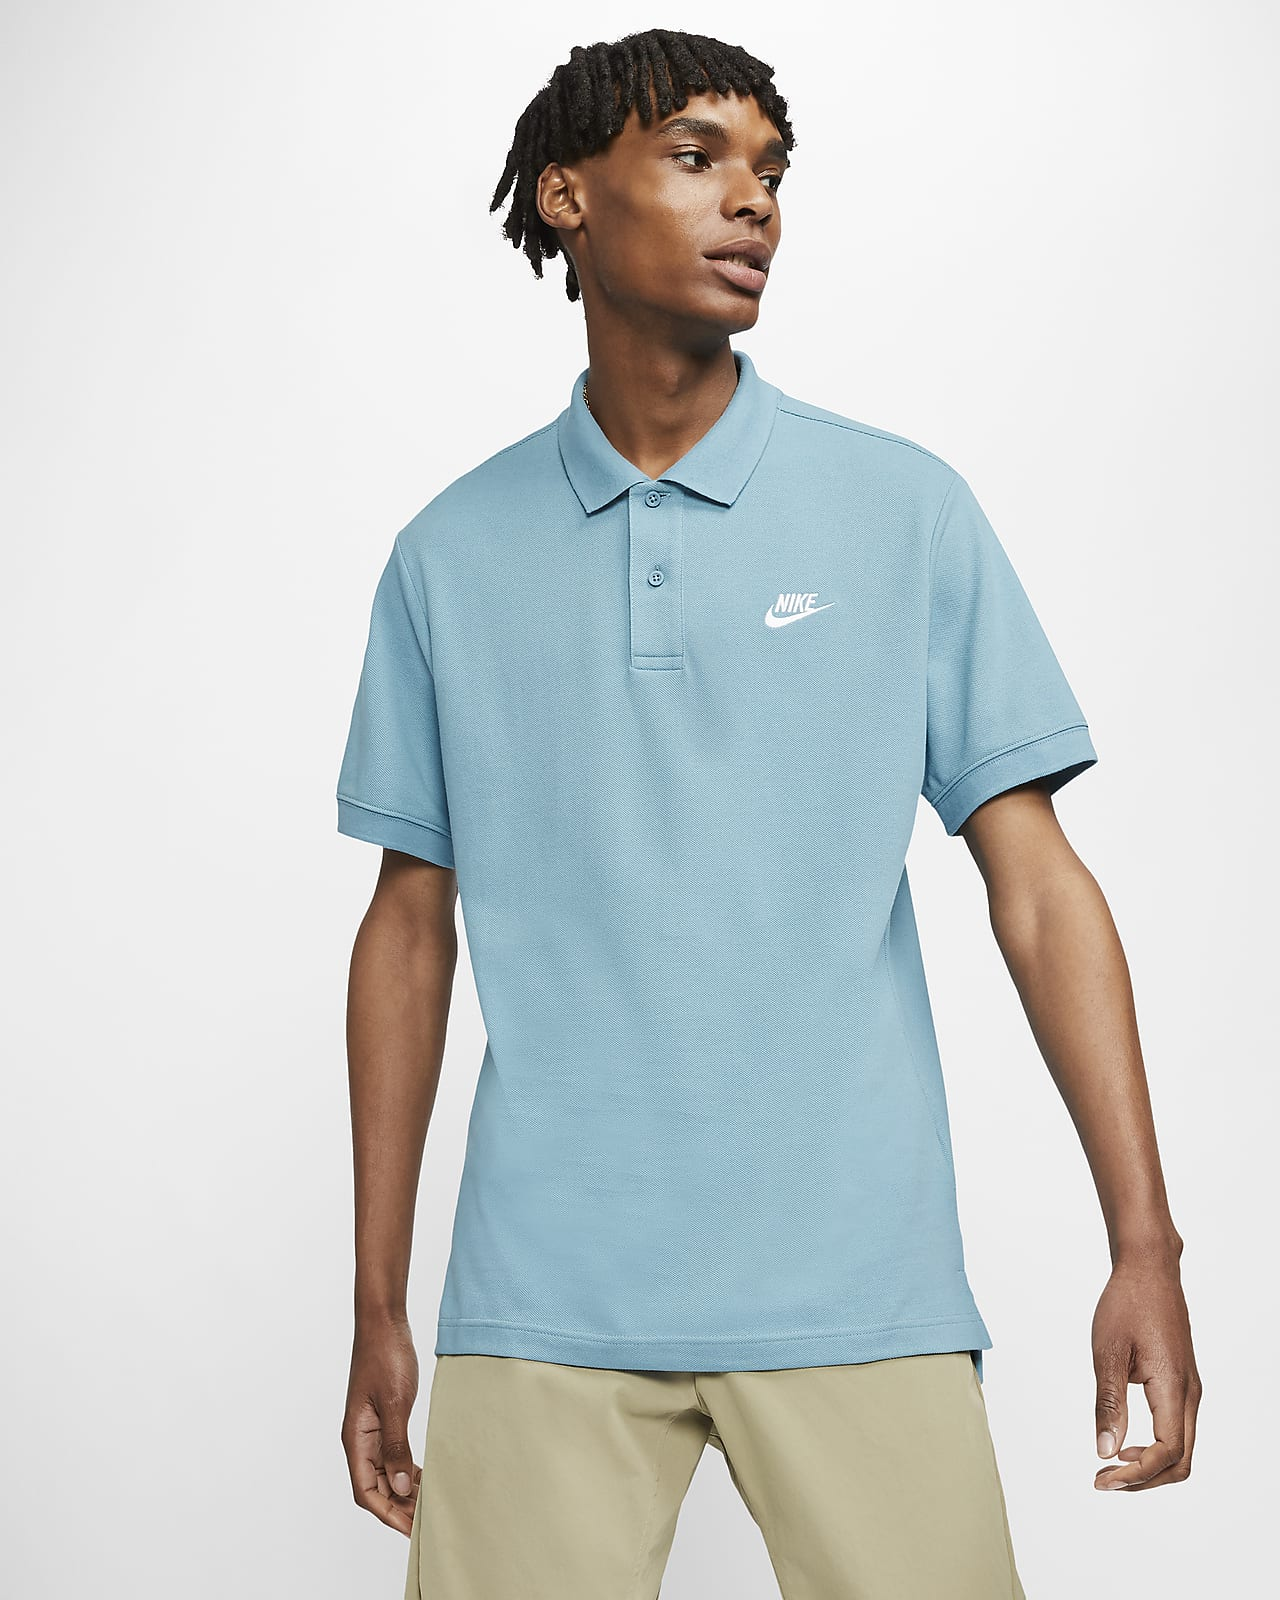 Nike Sportswear poloskjorte for herre